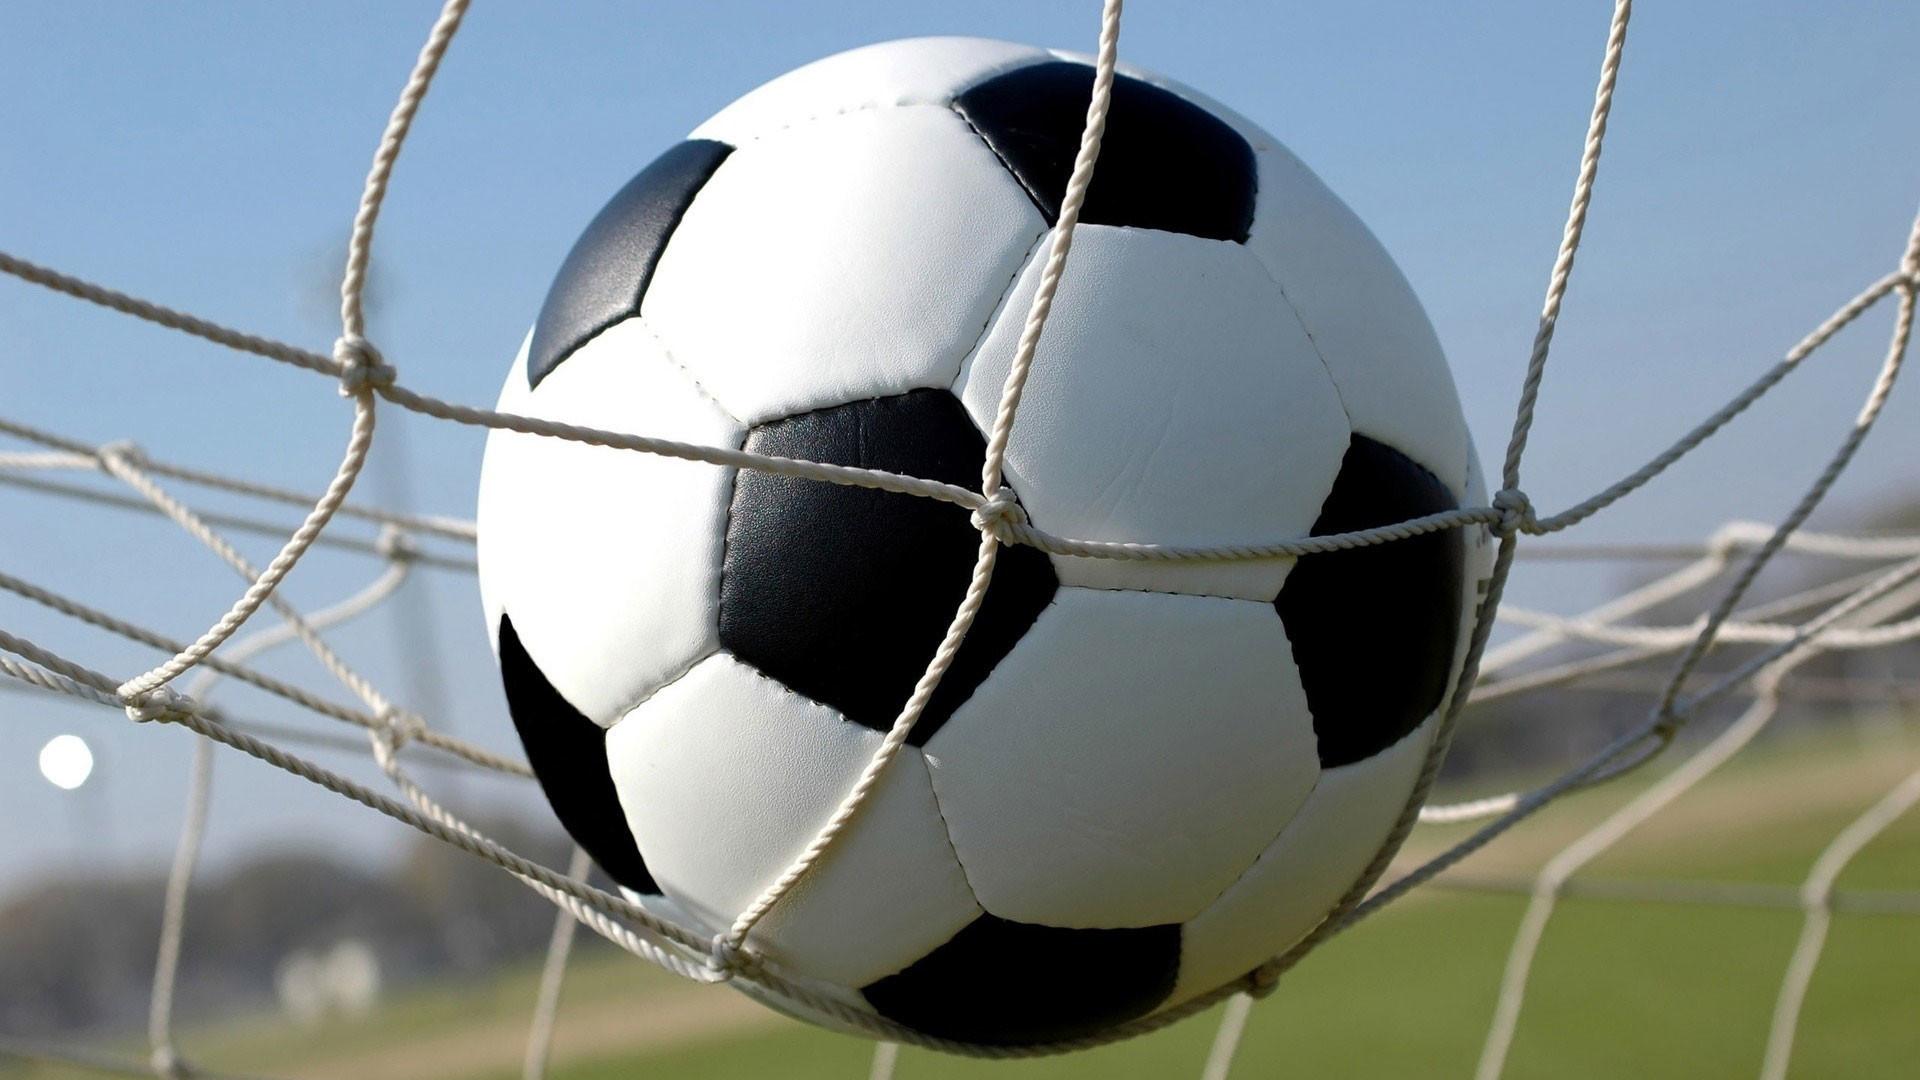 hd pics photos sports football goal hd desktop background wallpaper